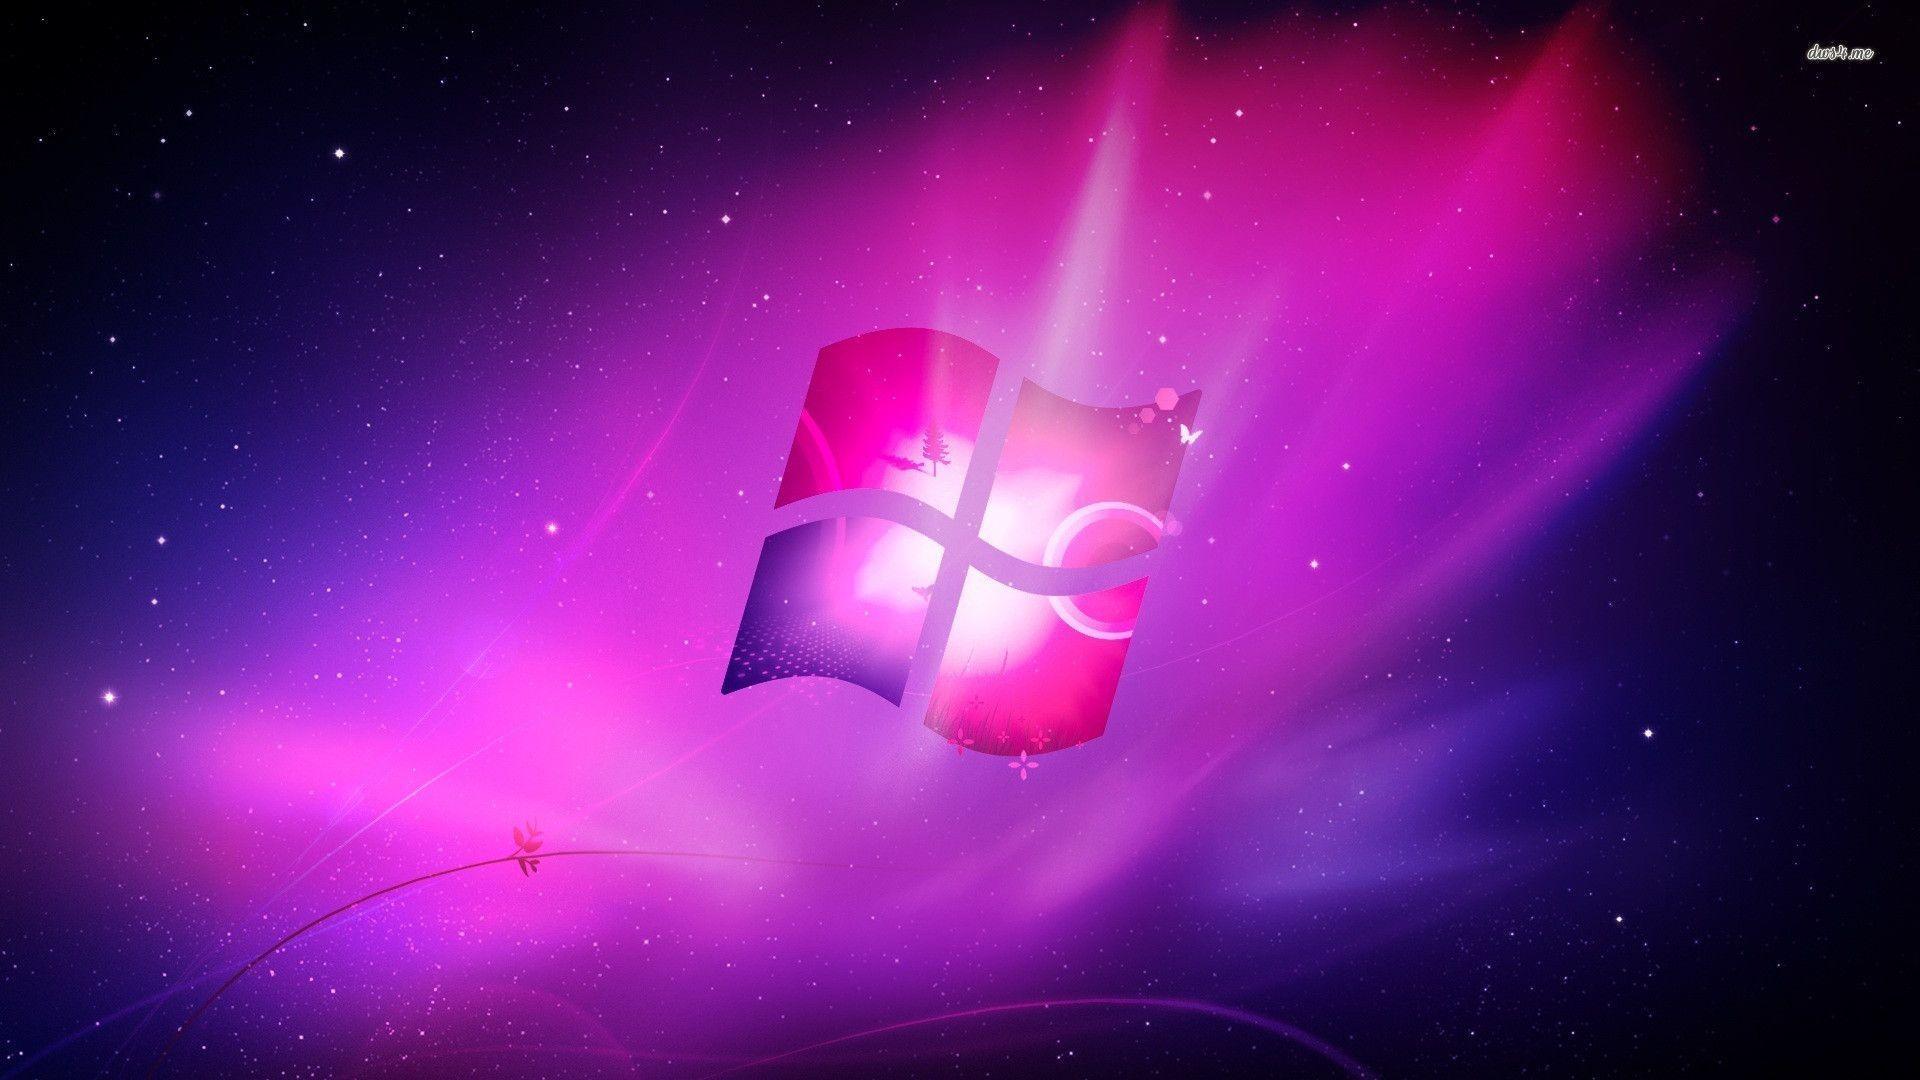 purple spidey computer wallpapers - photo #7